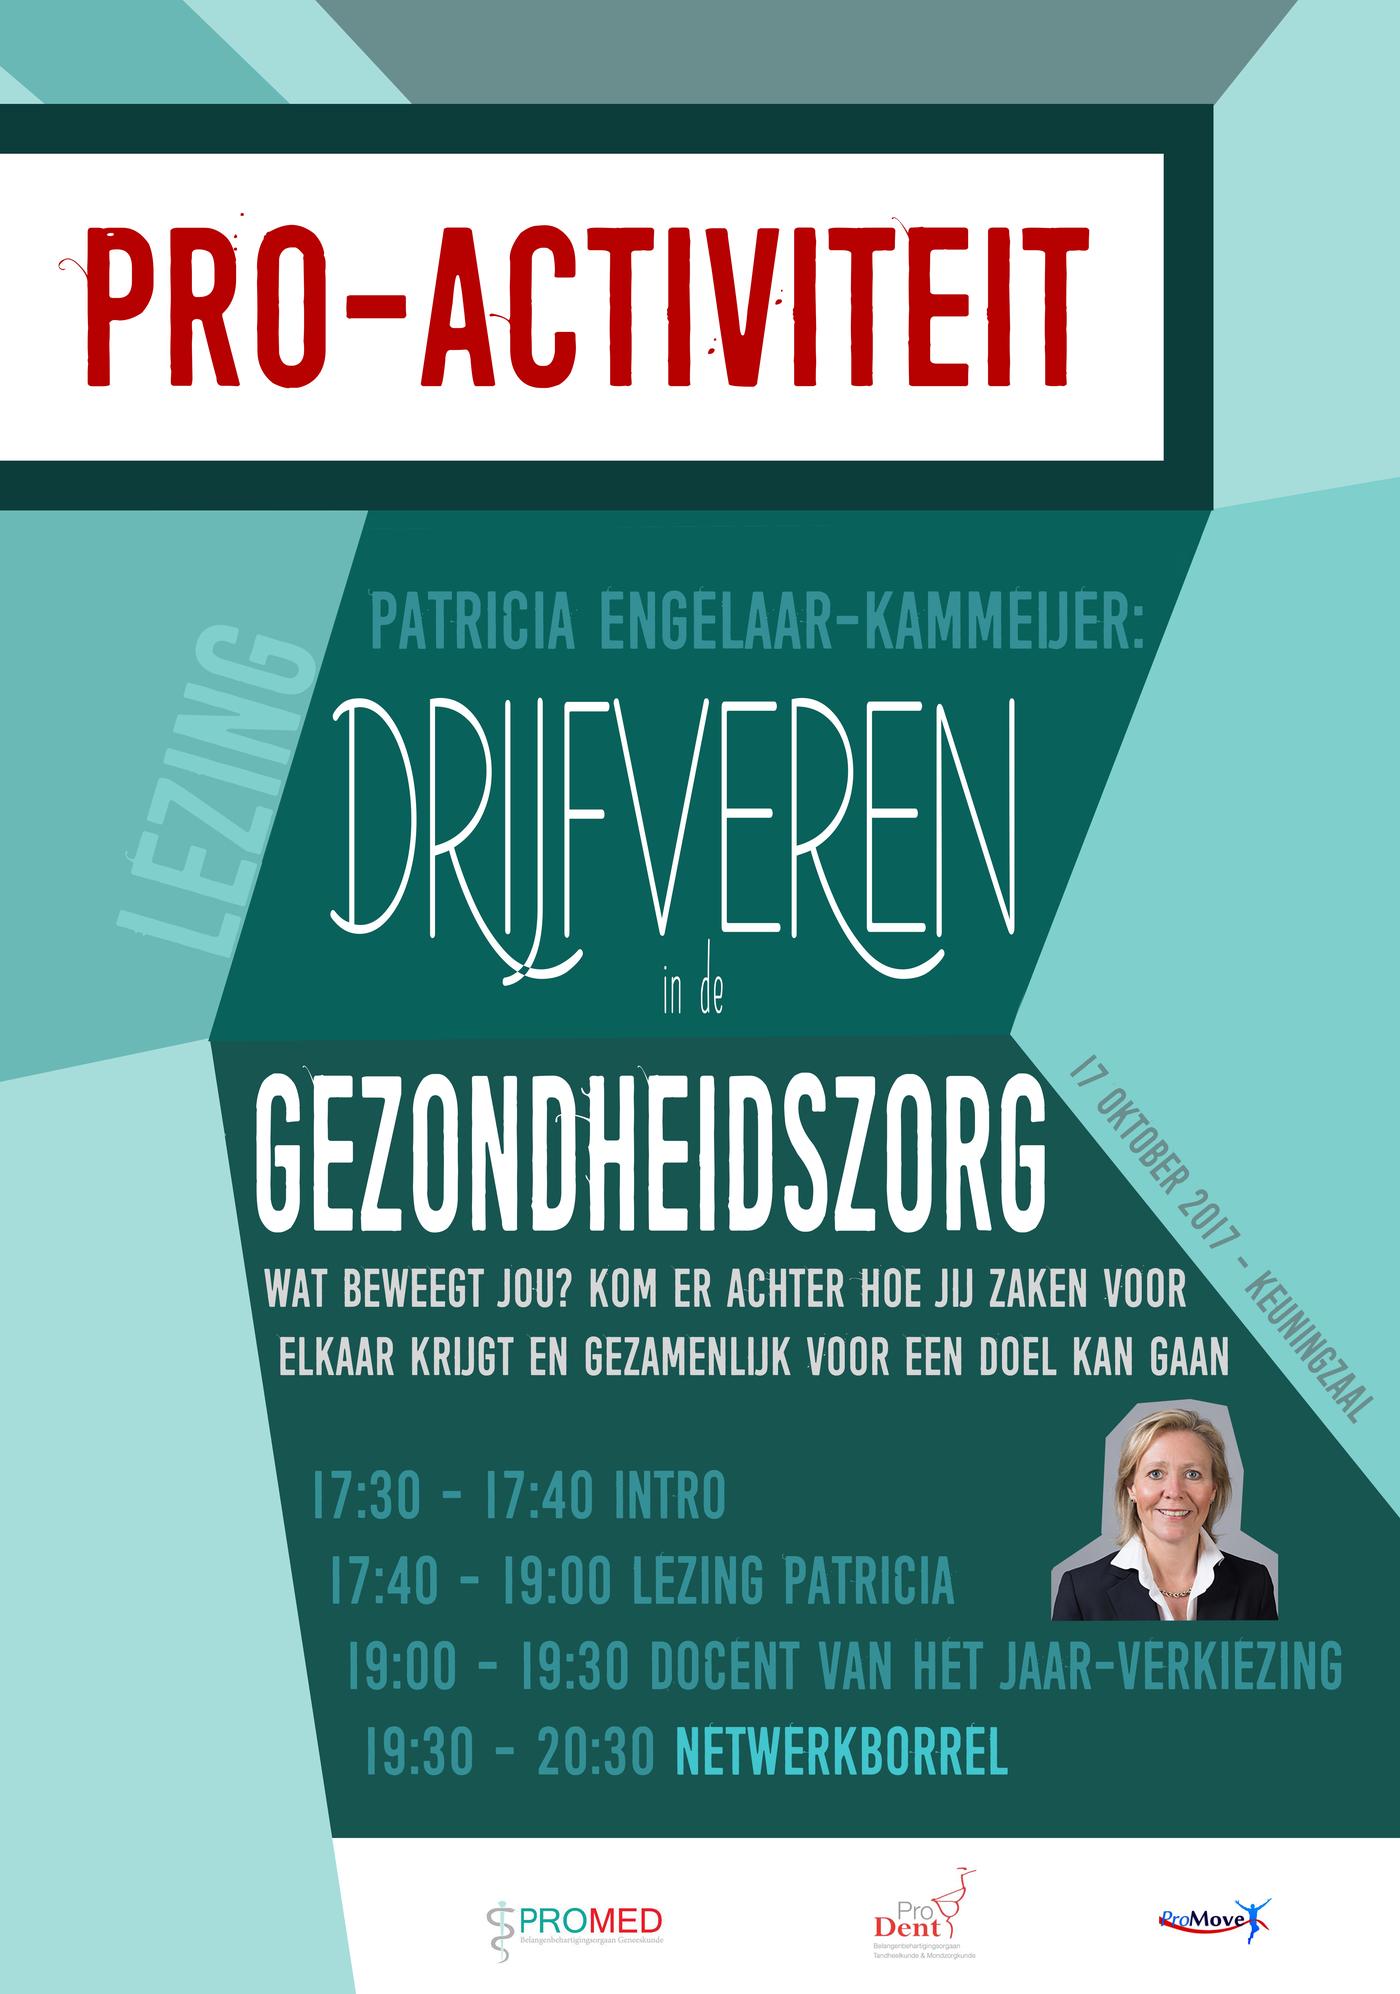 Pro-activiteit